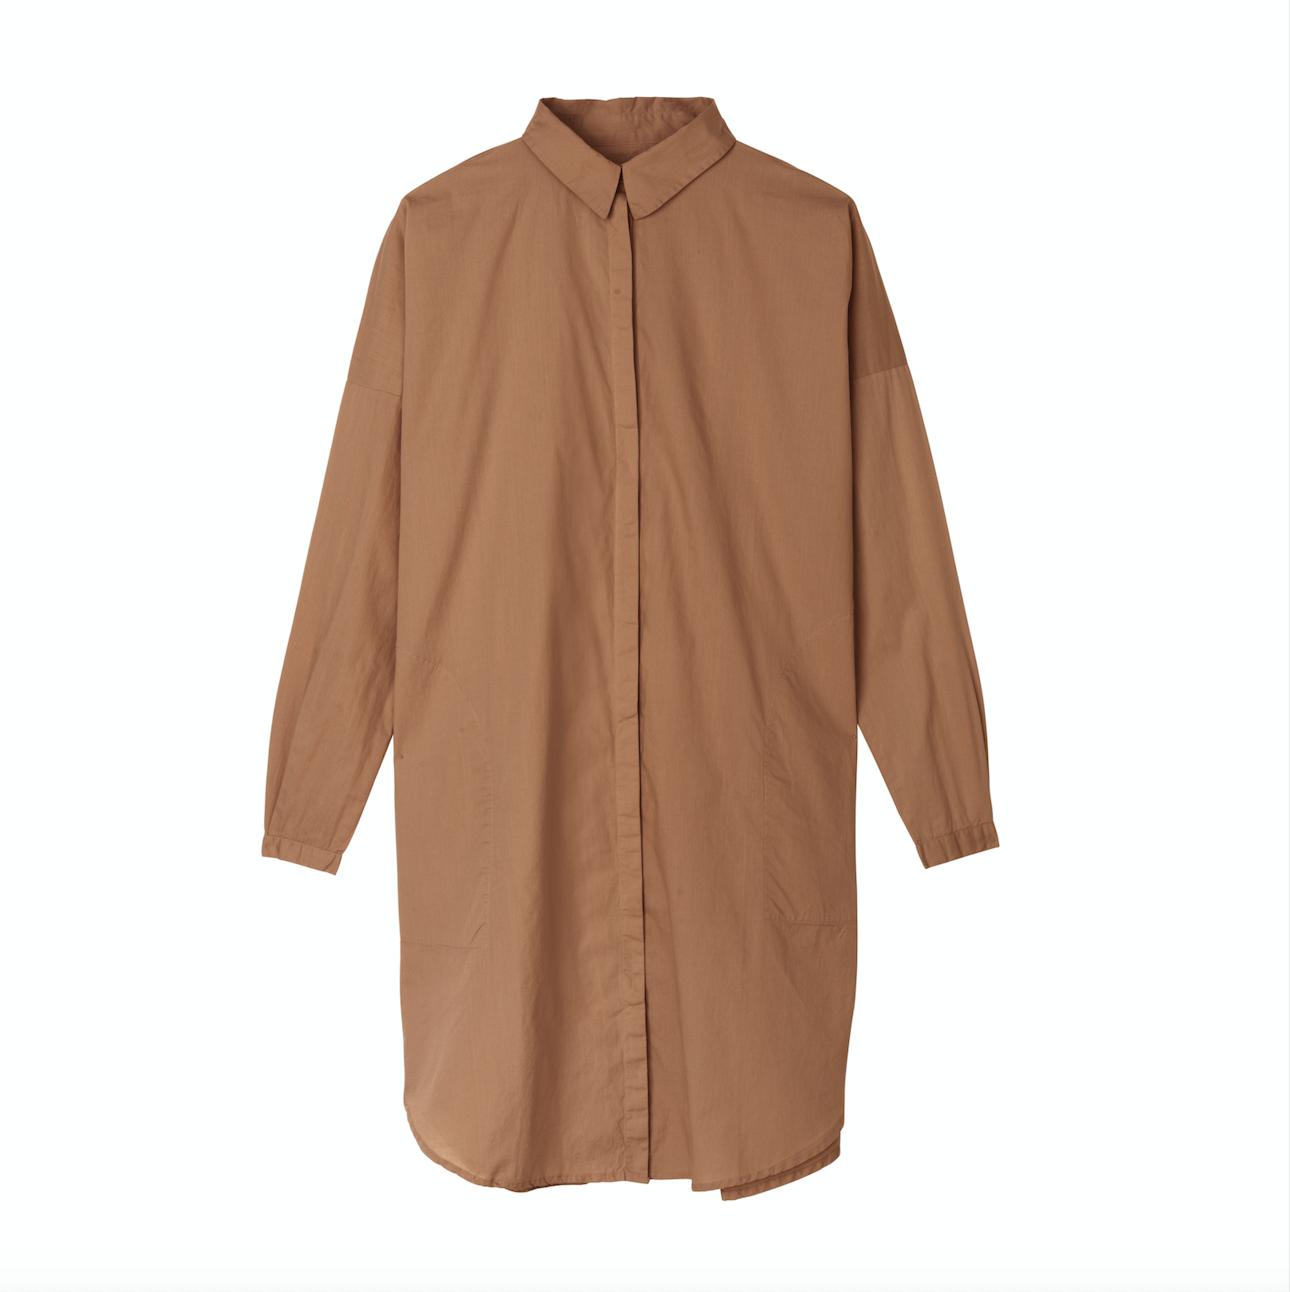 SHIRT DRESS TABACCO